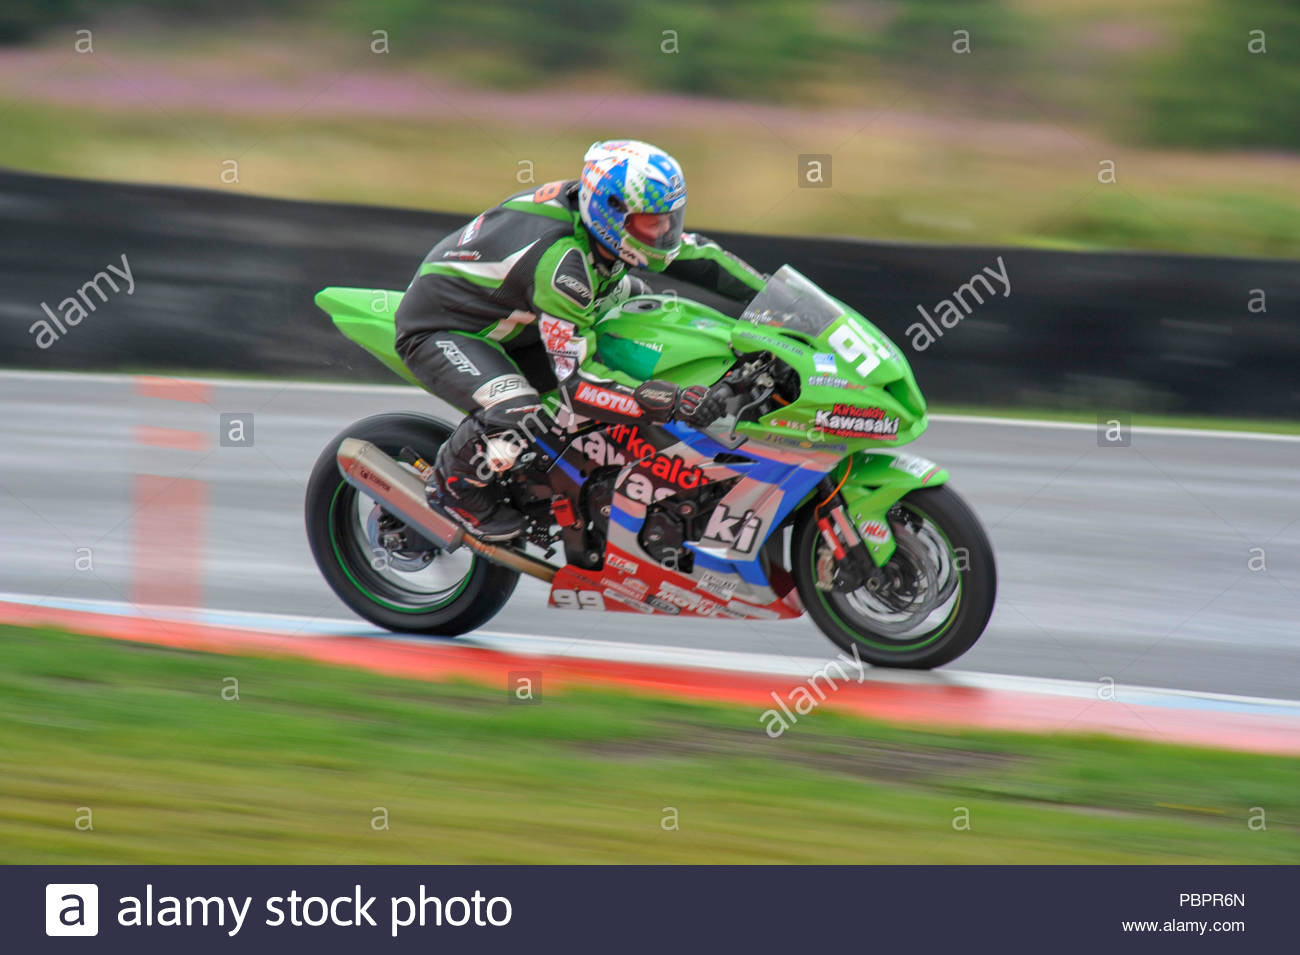 Dunfermline, UK  29 July, 2018  Callum Grigor's Kawasaki ZX10RR in a